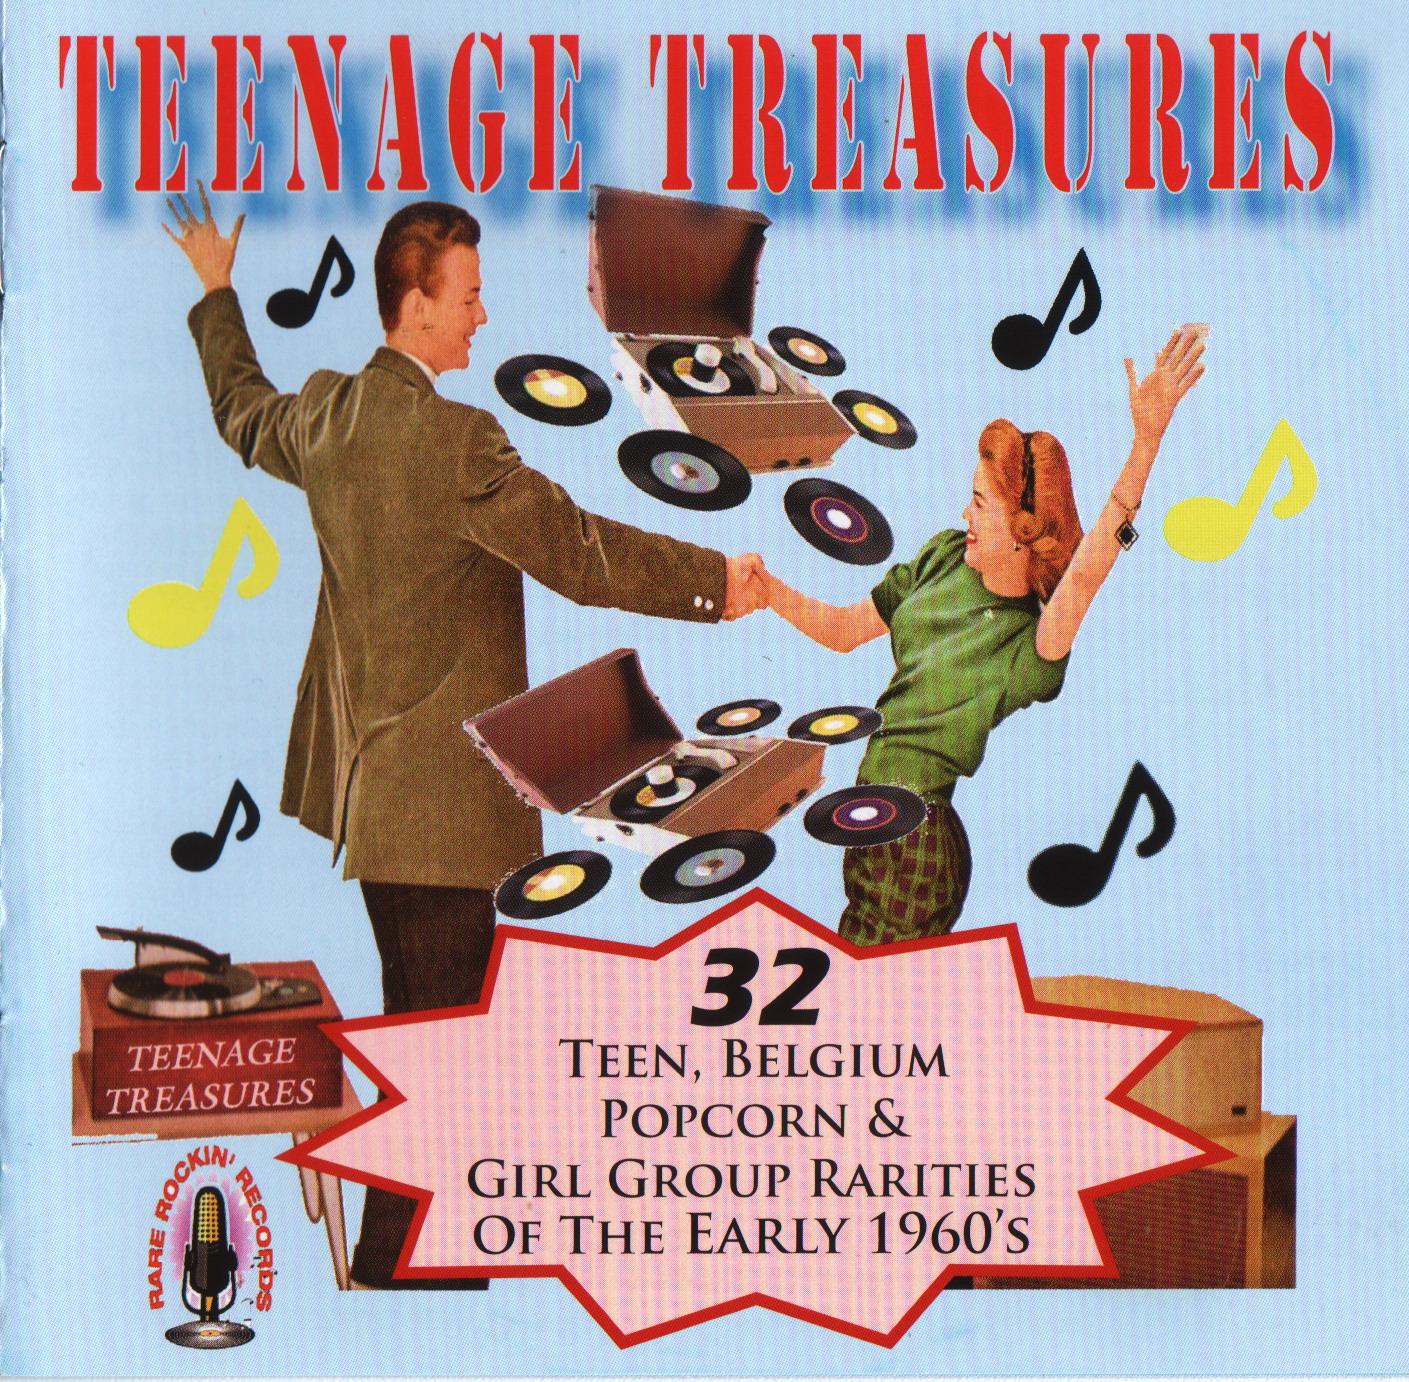 Teenage Treasures (32 Teen, Belgium Popcorn & Girl Group Rarities Of The ...